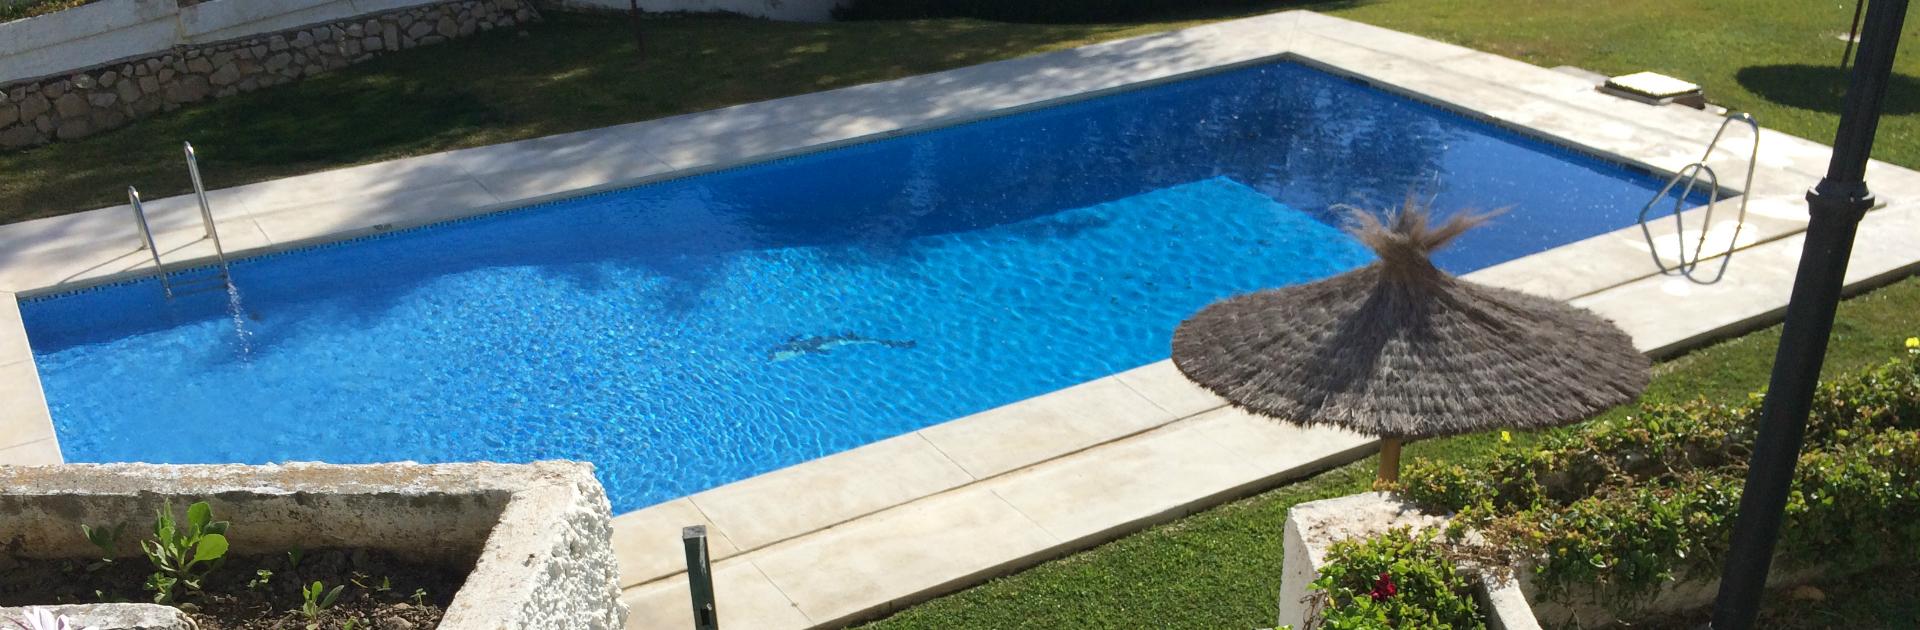 Swimmingpool-Malaga-Ferielejlighed